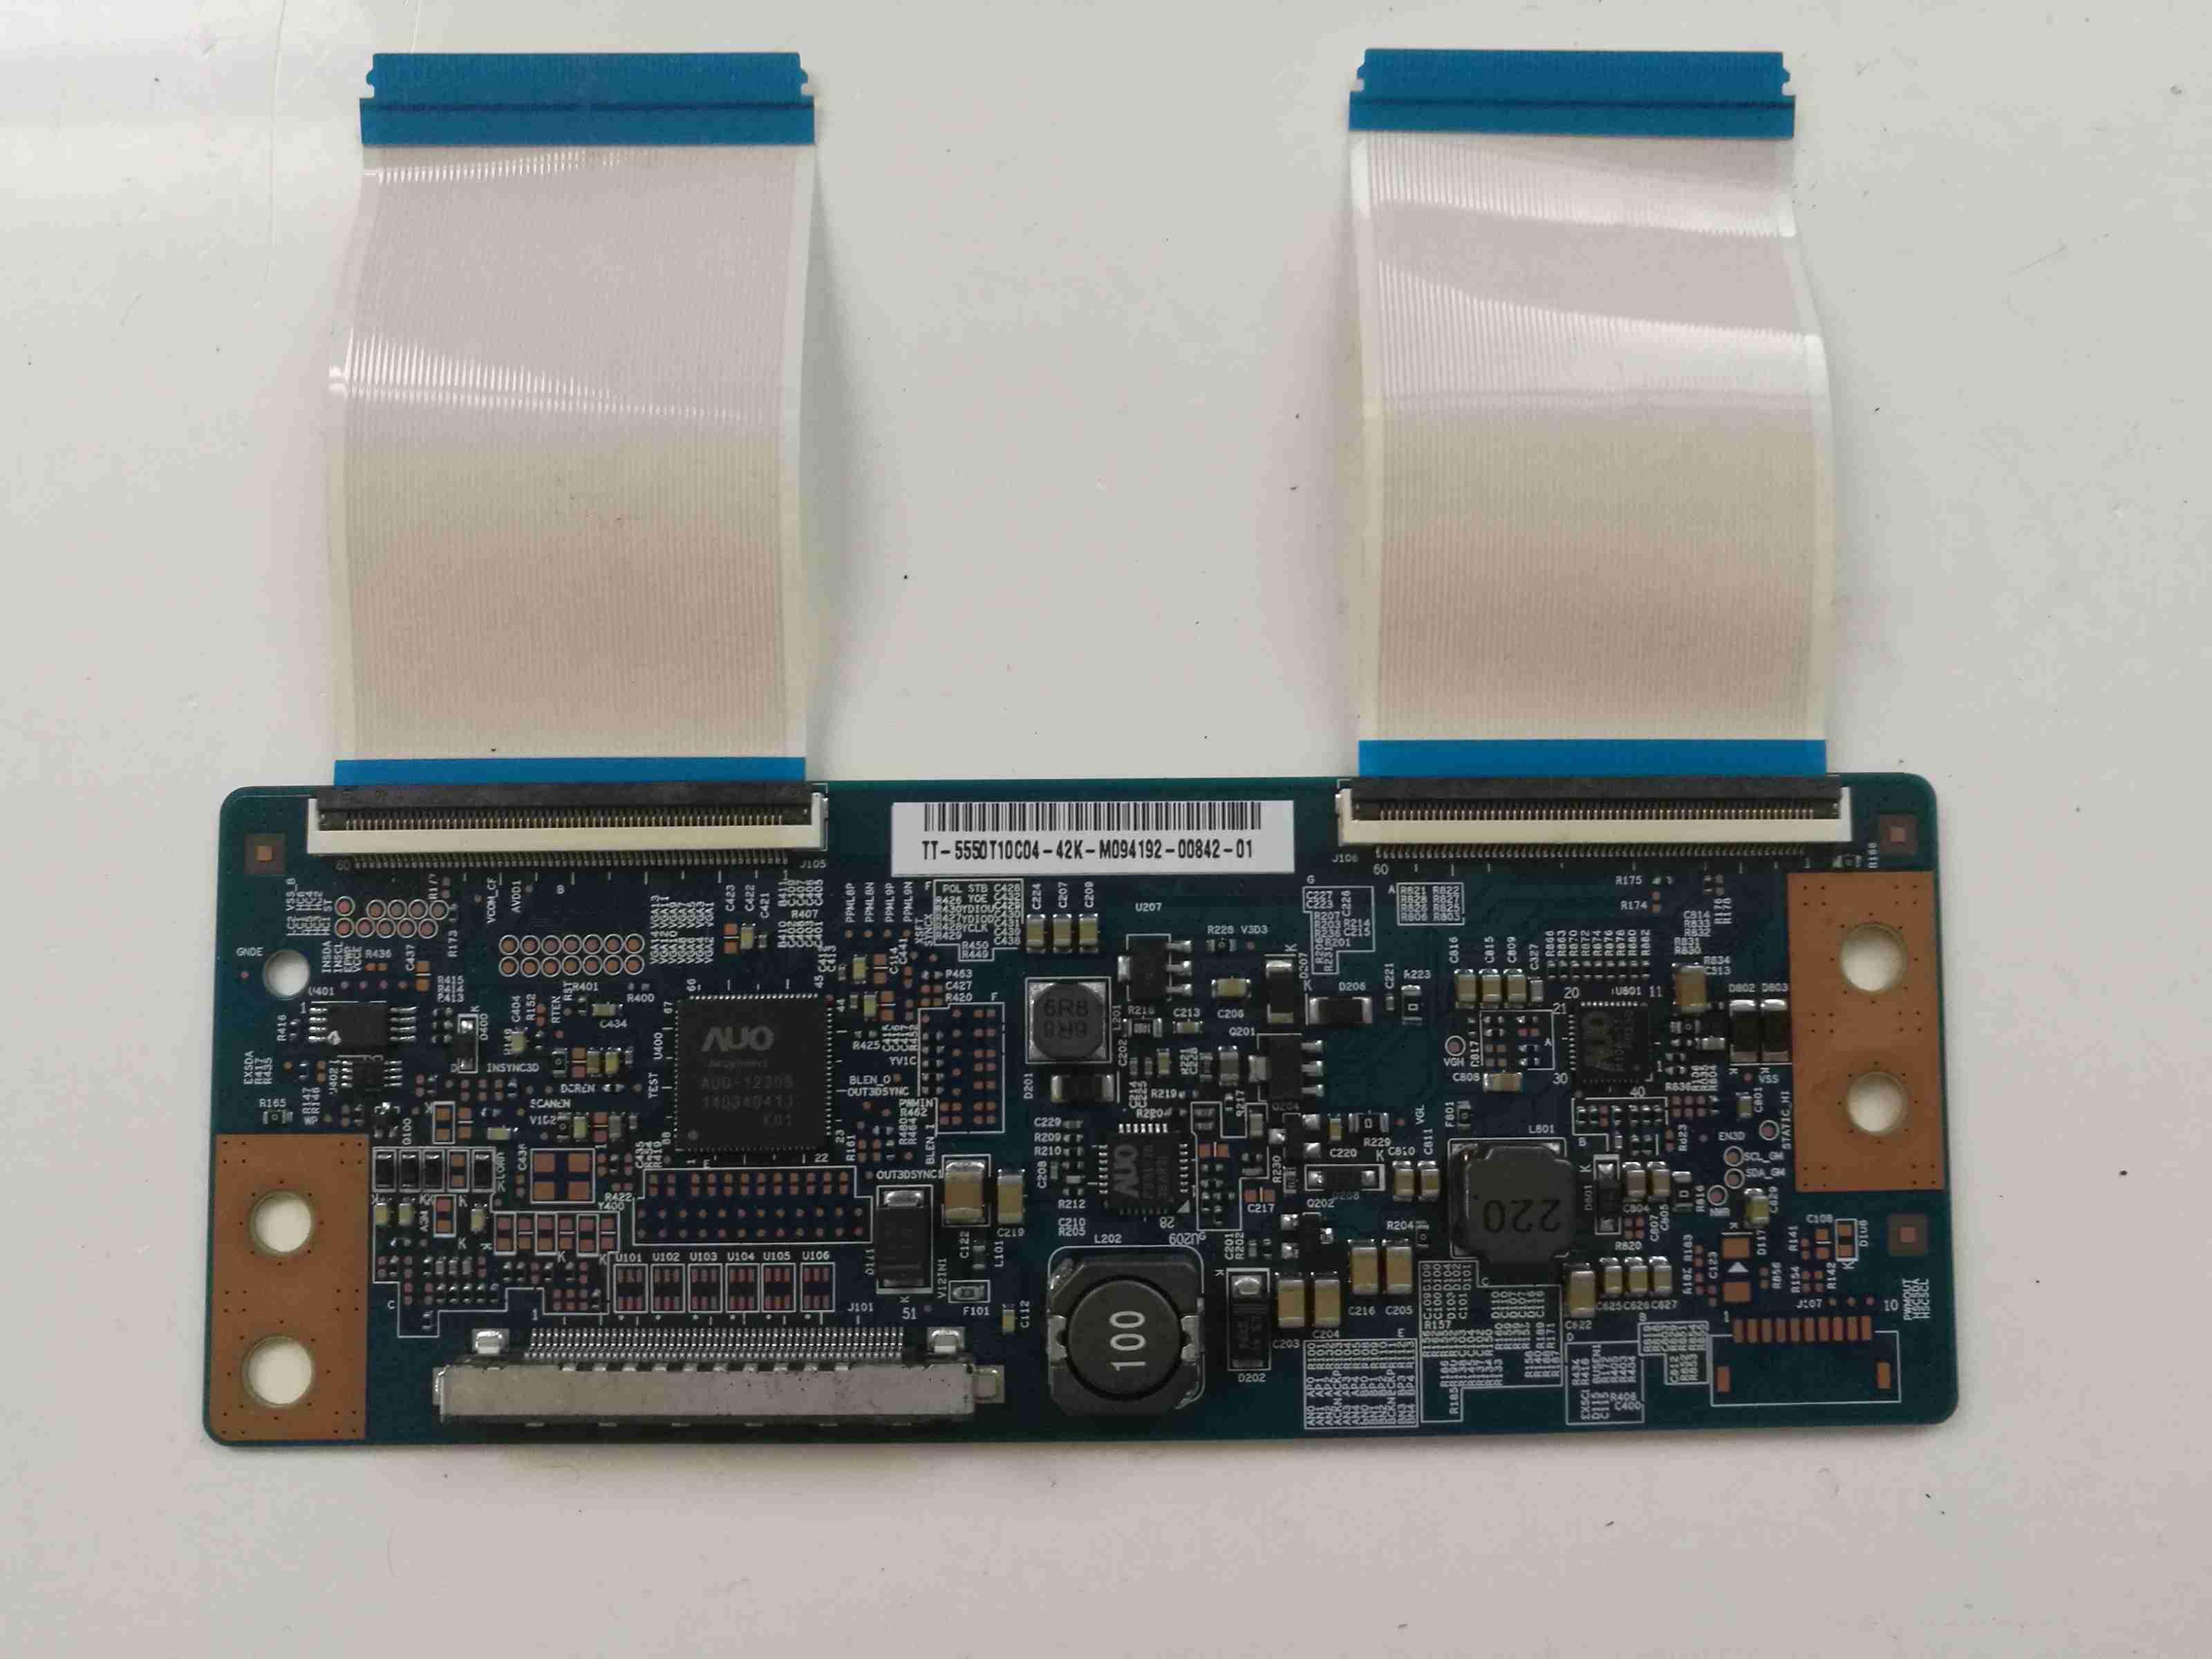 Circuits Main Board Power Board Circuit Constant Current Board Led 46k310x3d Logic Board Y11-sq60pbmb4c4lv0.0 He460ffd-b3 Screen